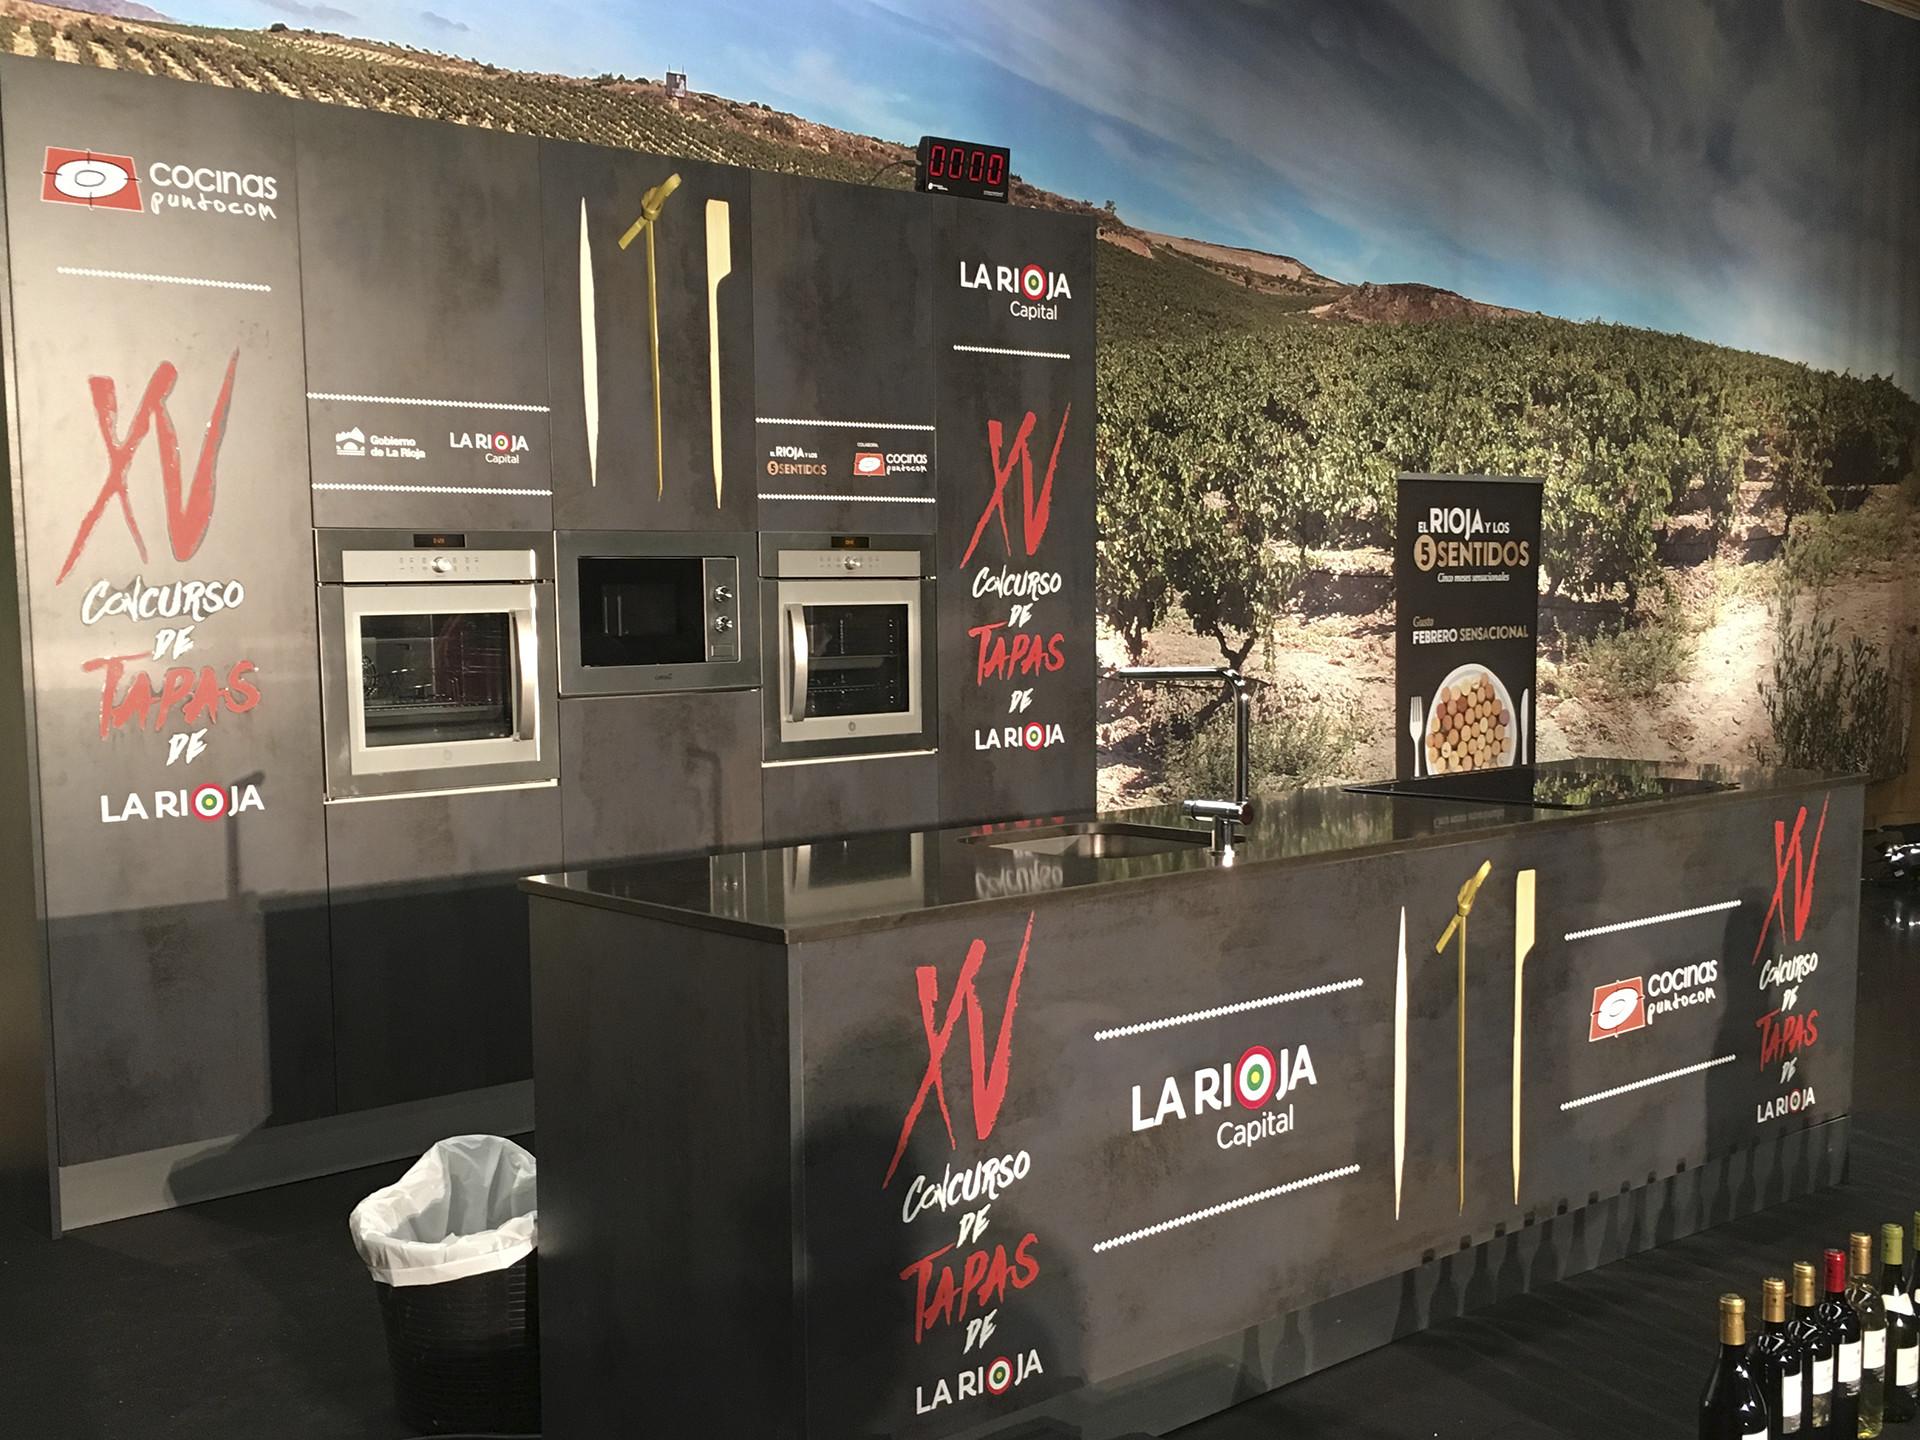 Diseño cocina evento XV concurso tapas La Rioja